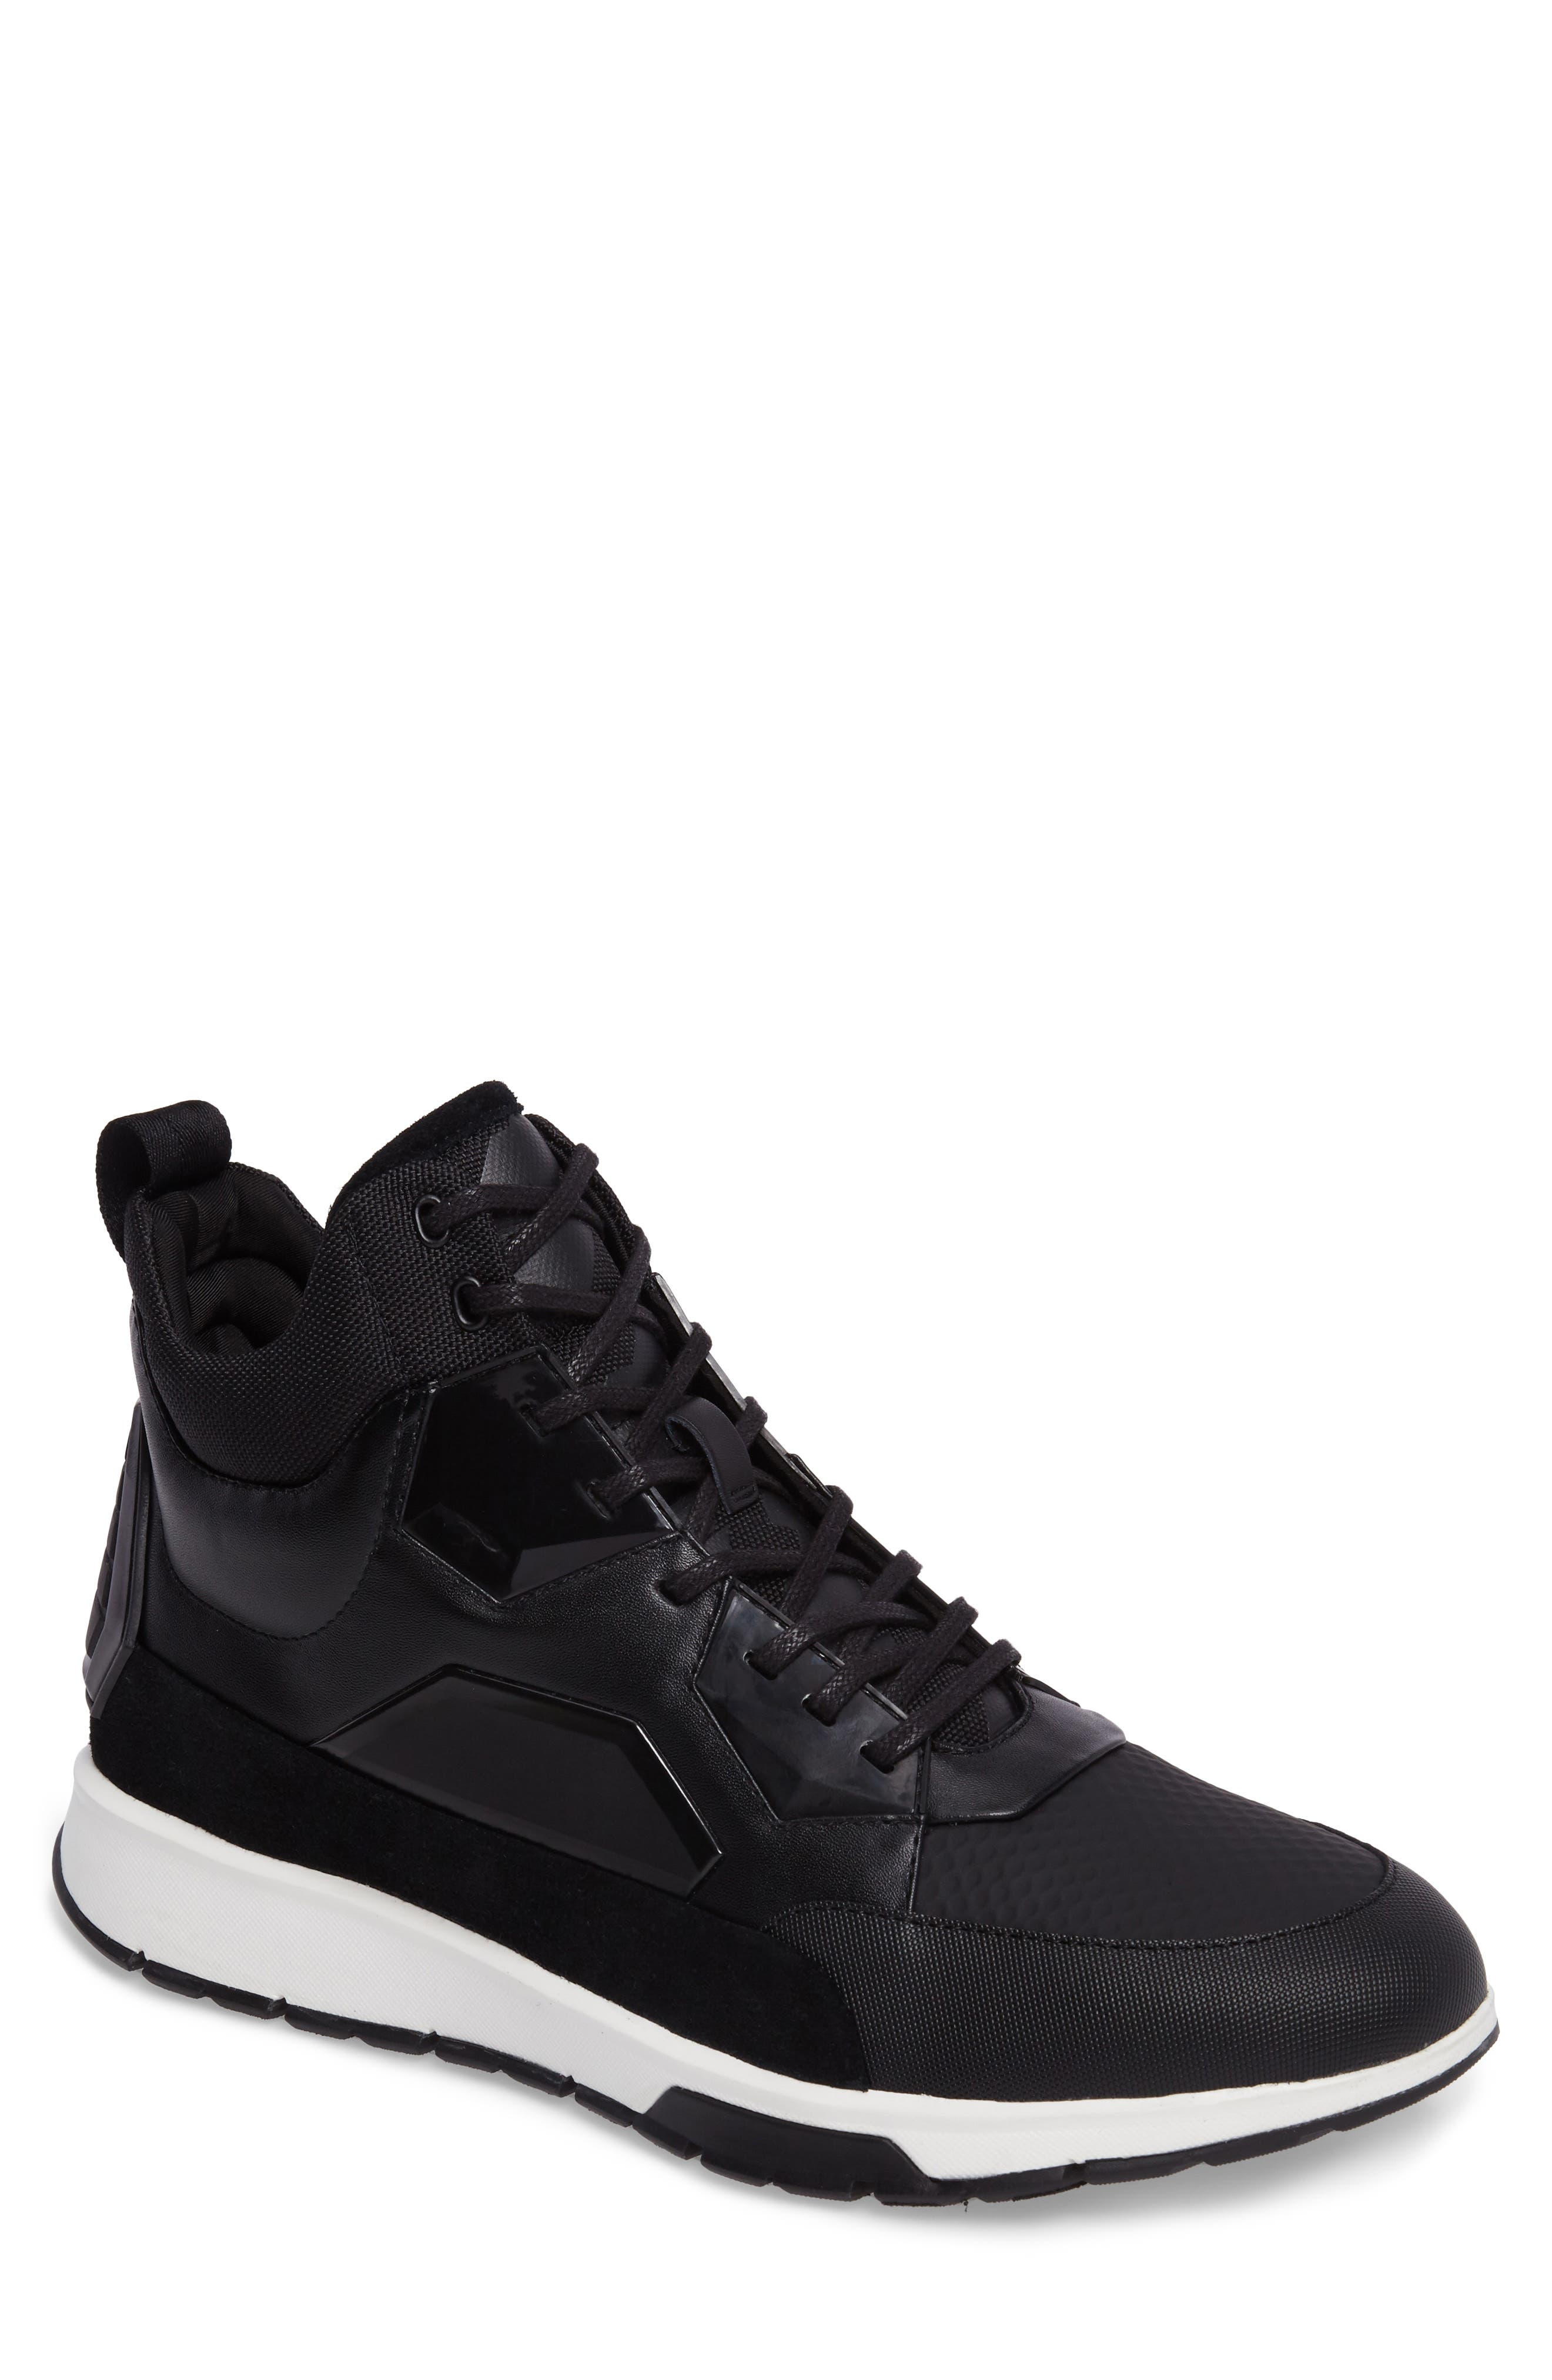 Kovan City Sneaker,                             Main thumbnail 1, color,                             001